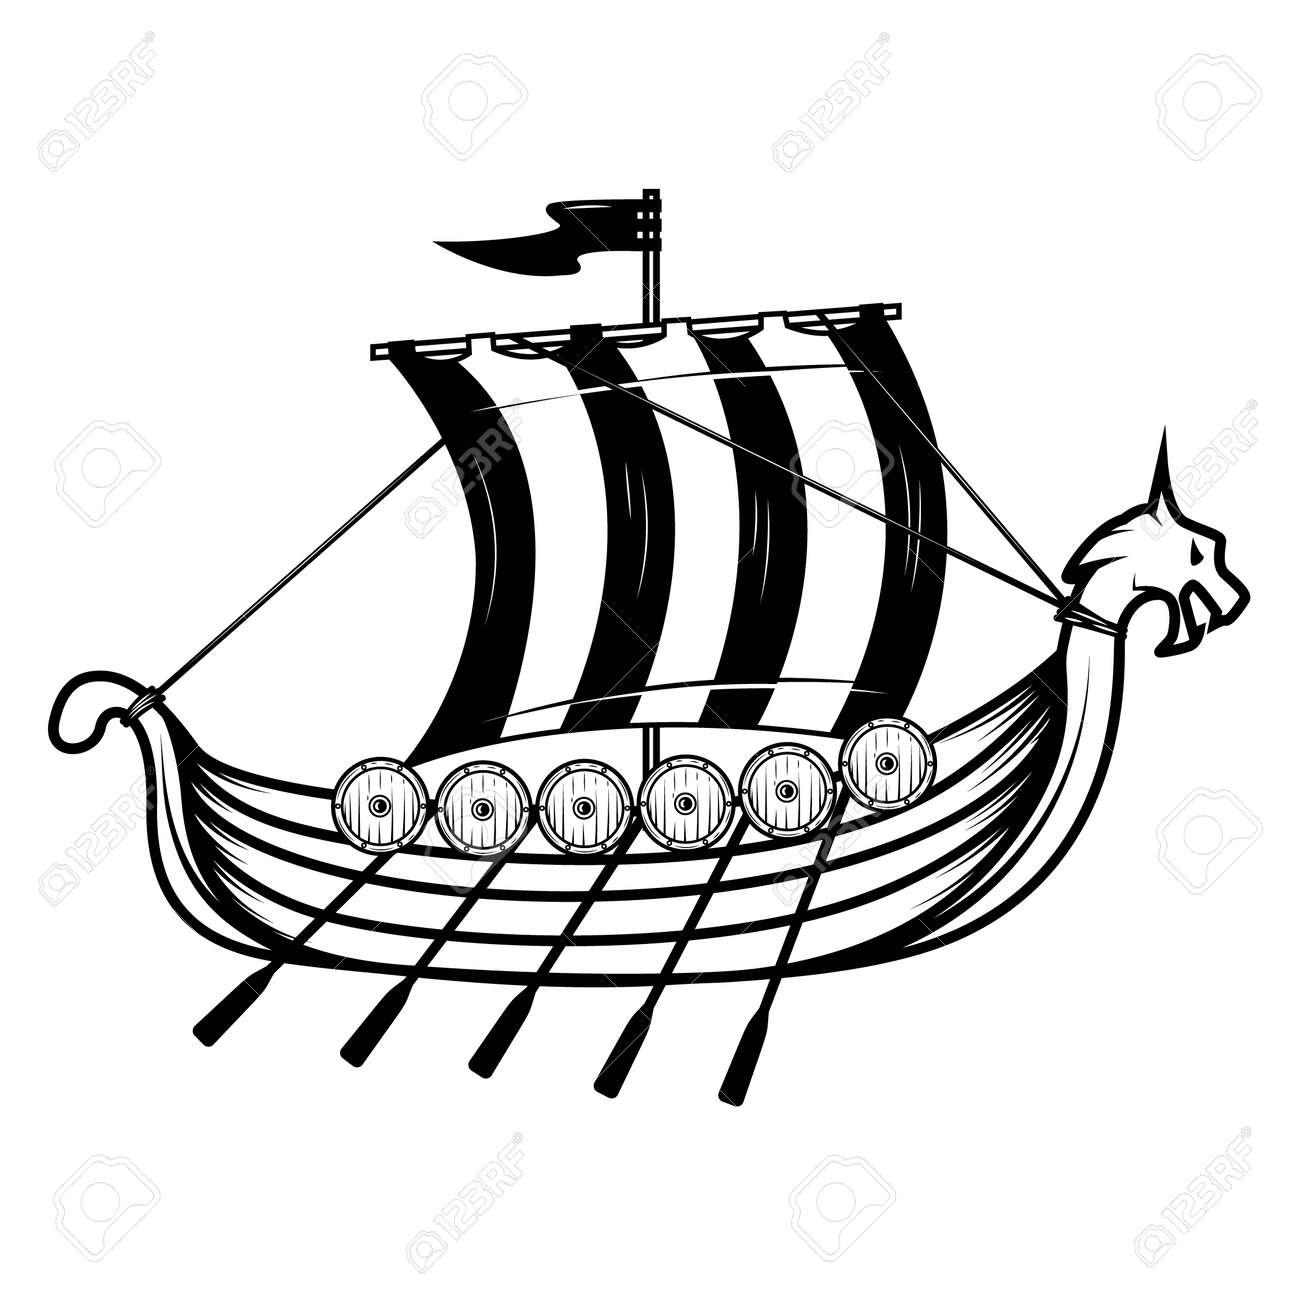 Vikings ship. Drakkar. Design element for poster, emblem, sign. Vector illustration - 171212871